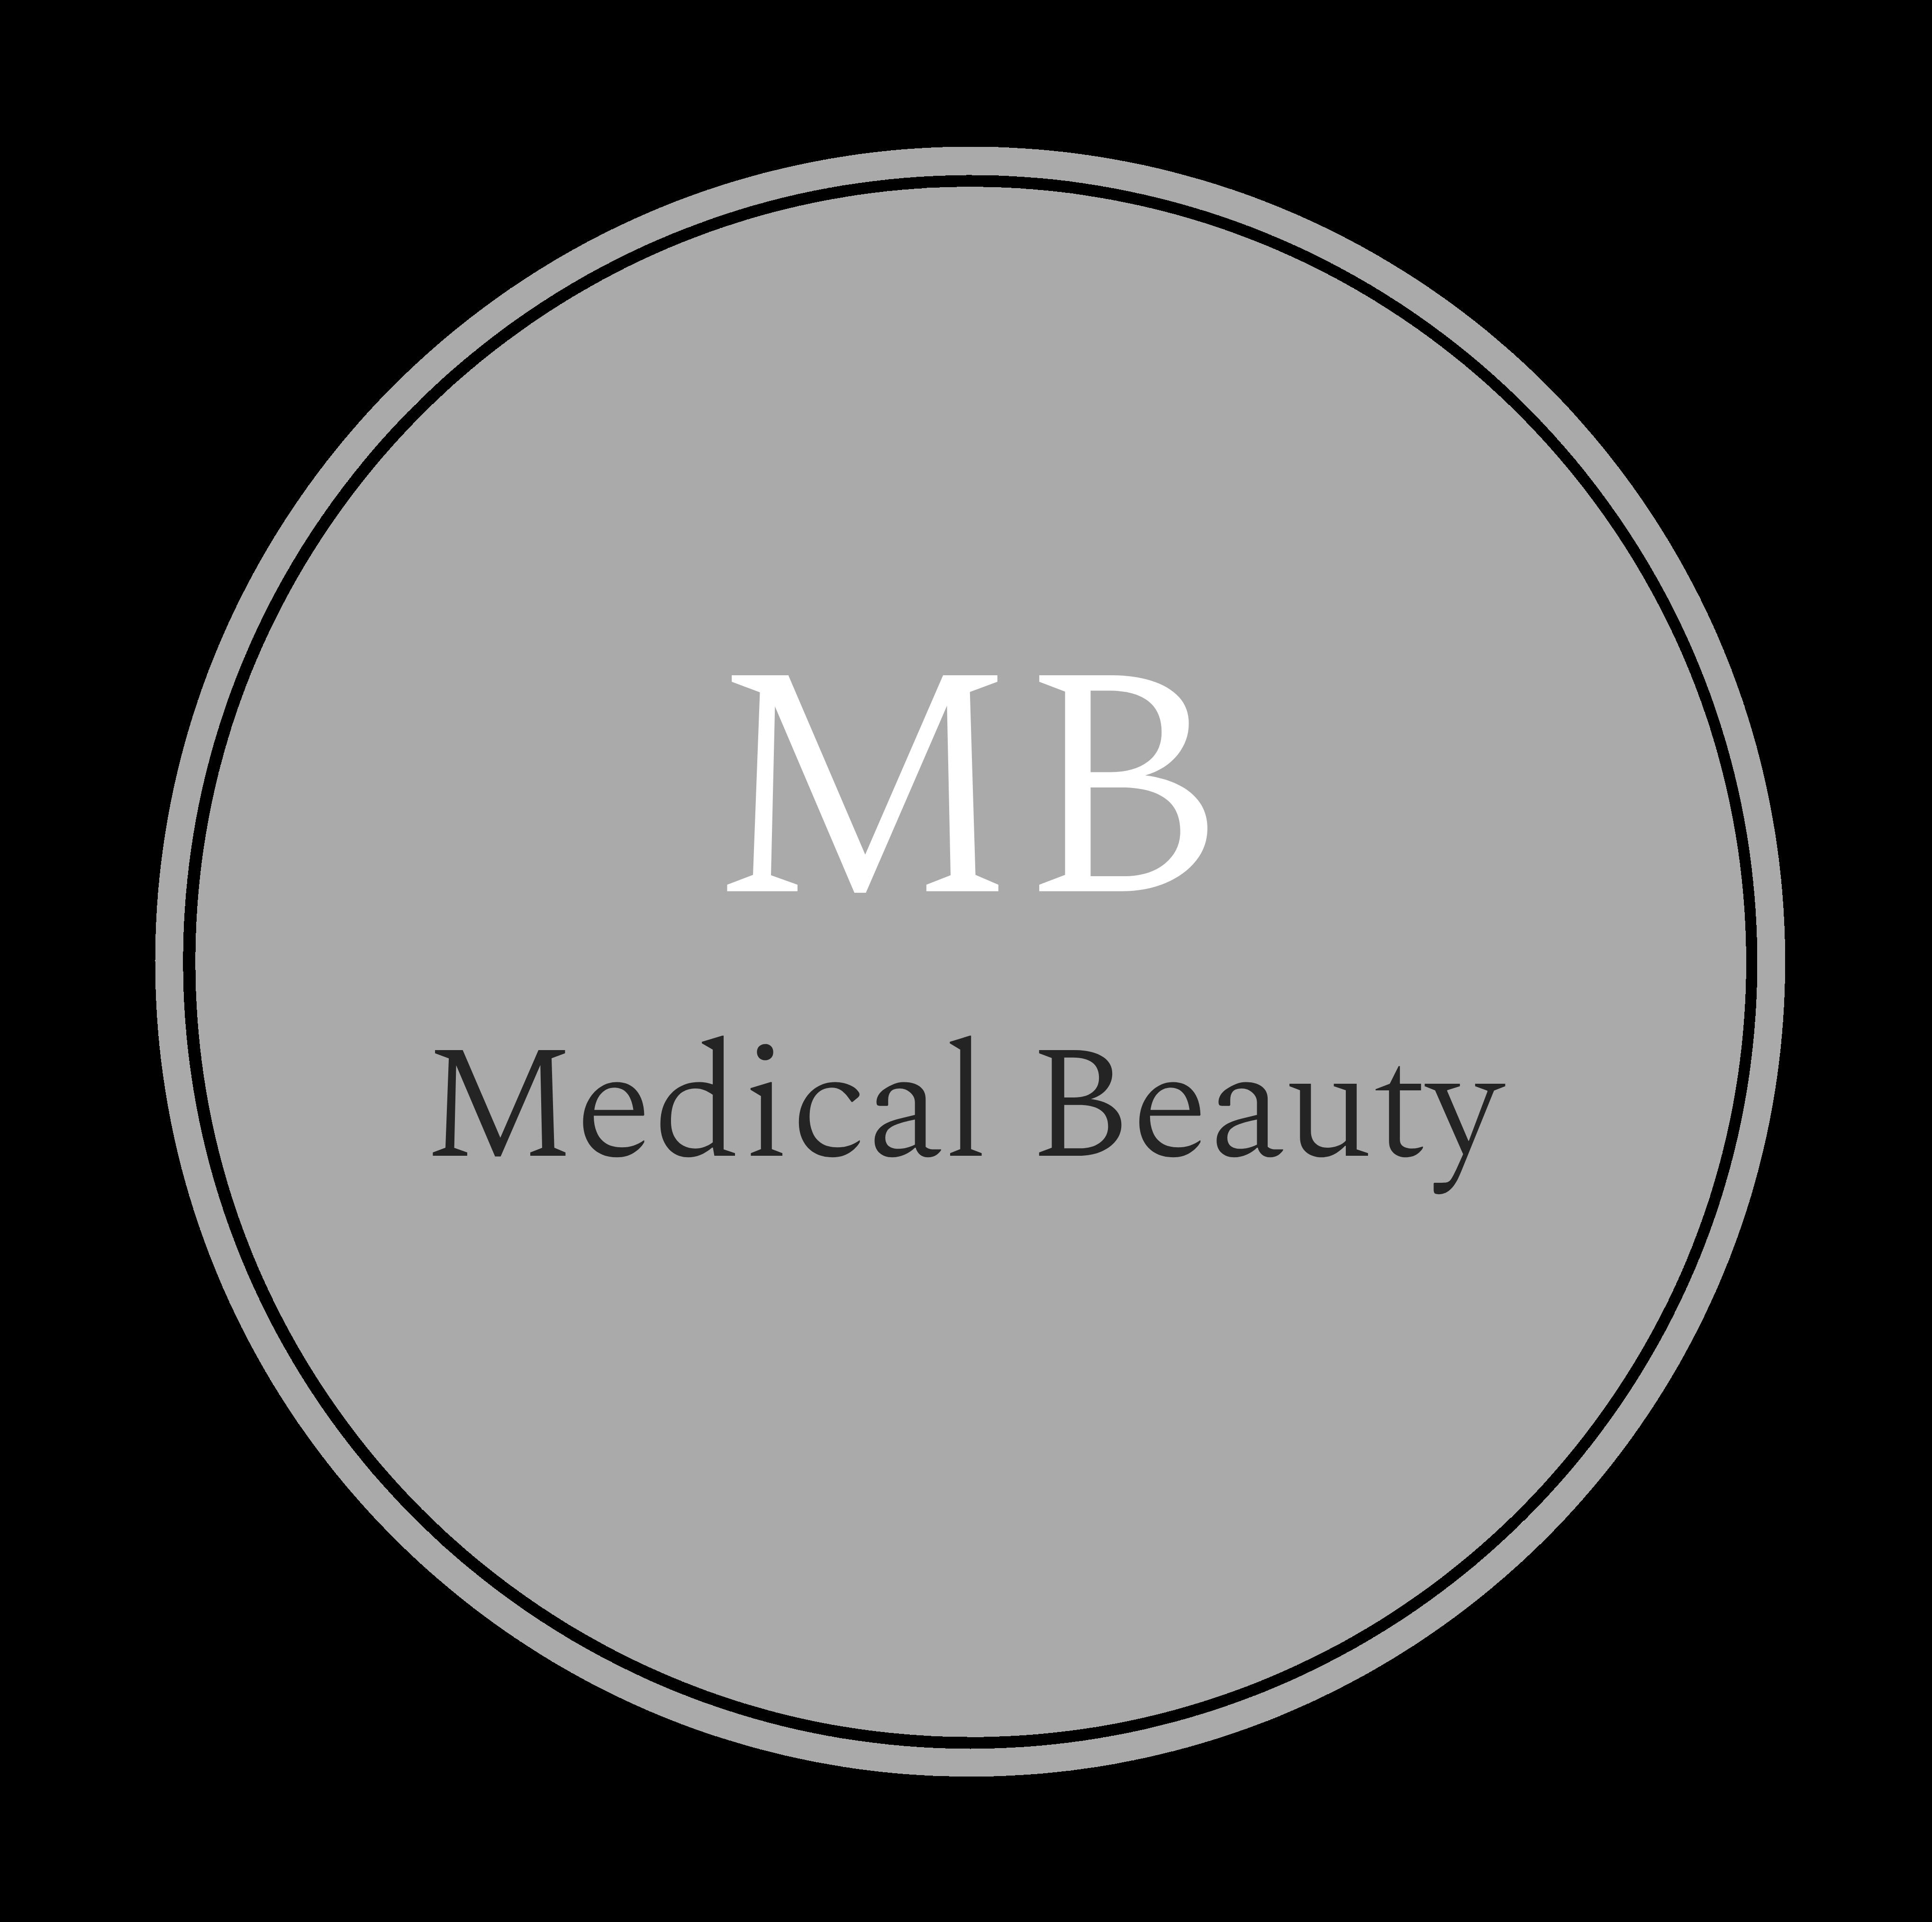 MB Medical Beauty Treatments